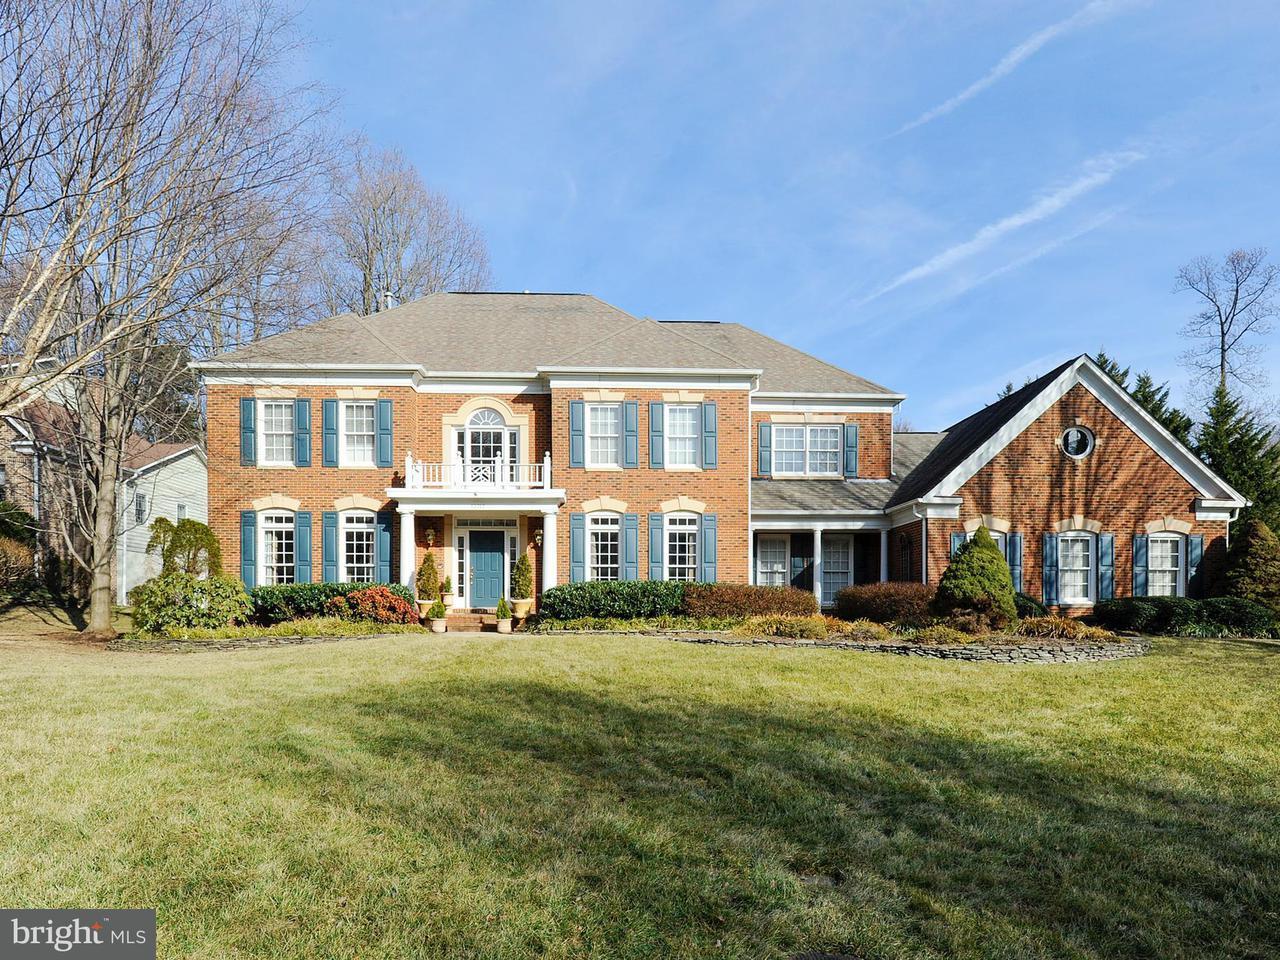 Single Family Home for Sale at 12212 Kyler Lane 12212 Kyler Lane Herndon, Virginia 20171 United States